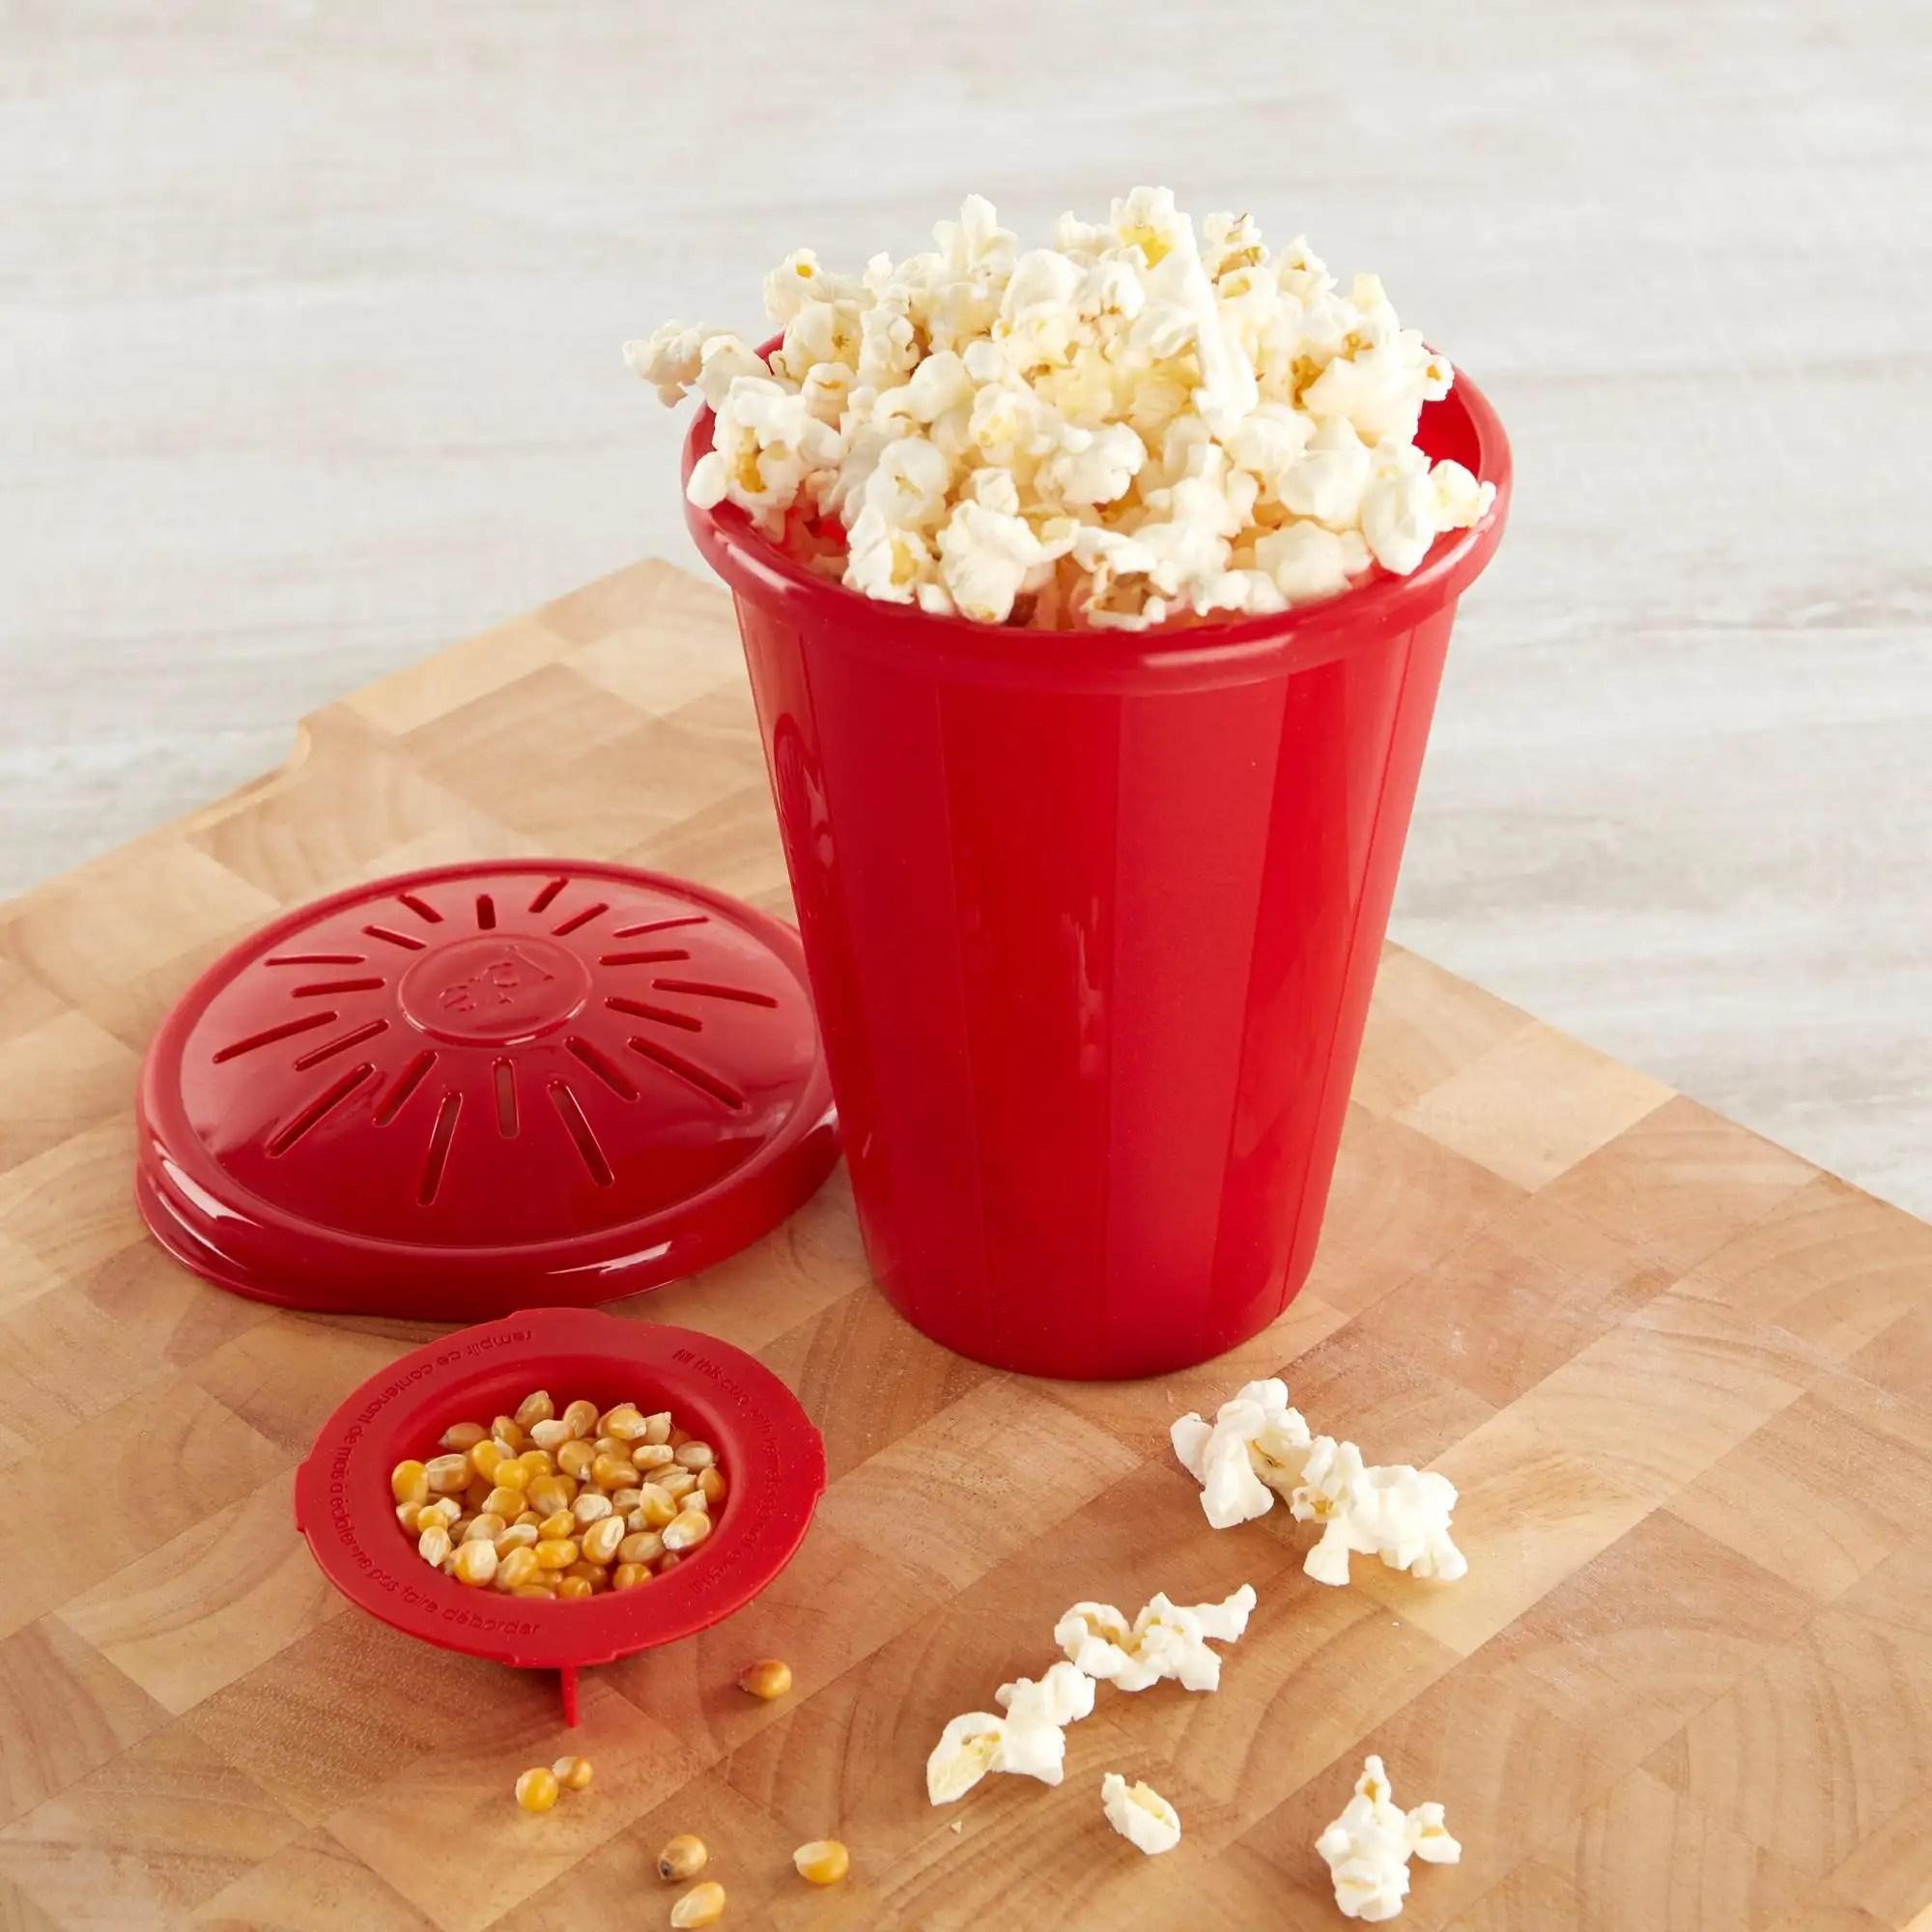 joie microwave popcorn maker red